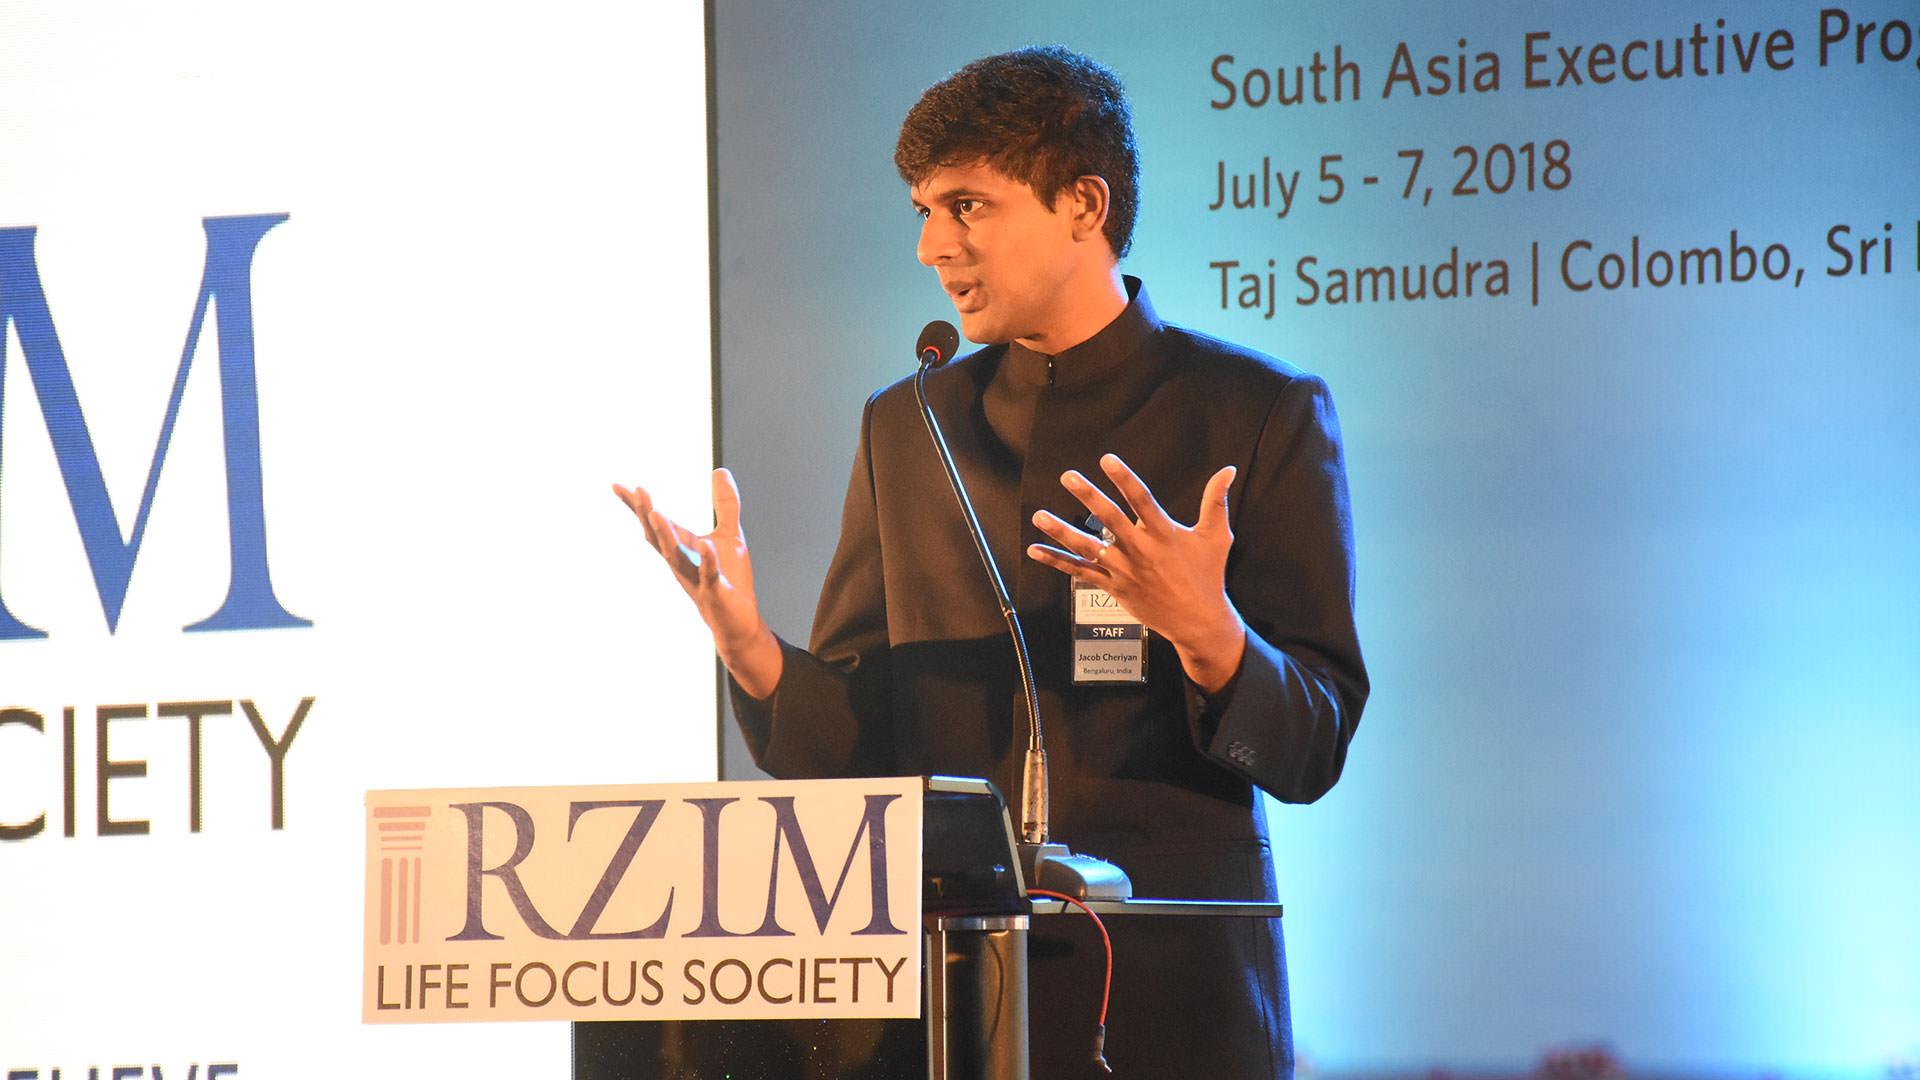 Jacob Cheriyan RZIM India